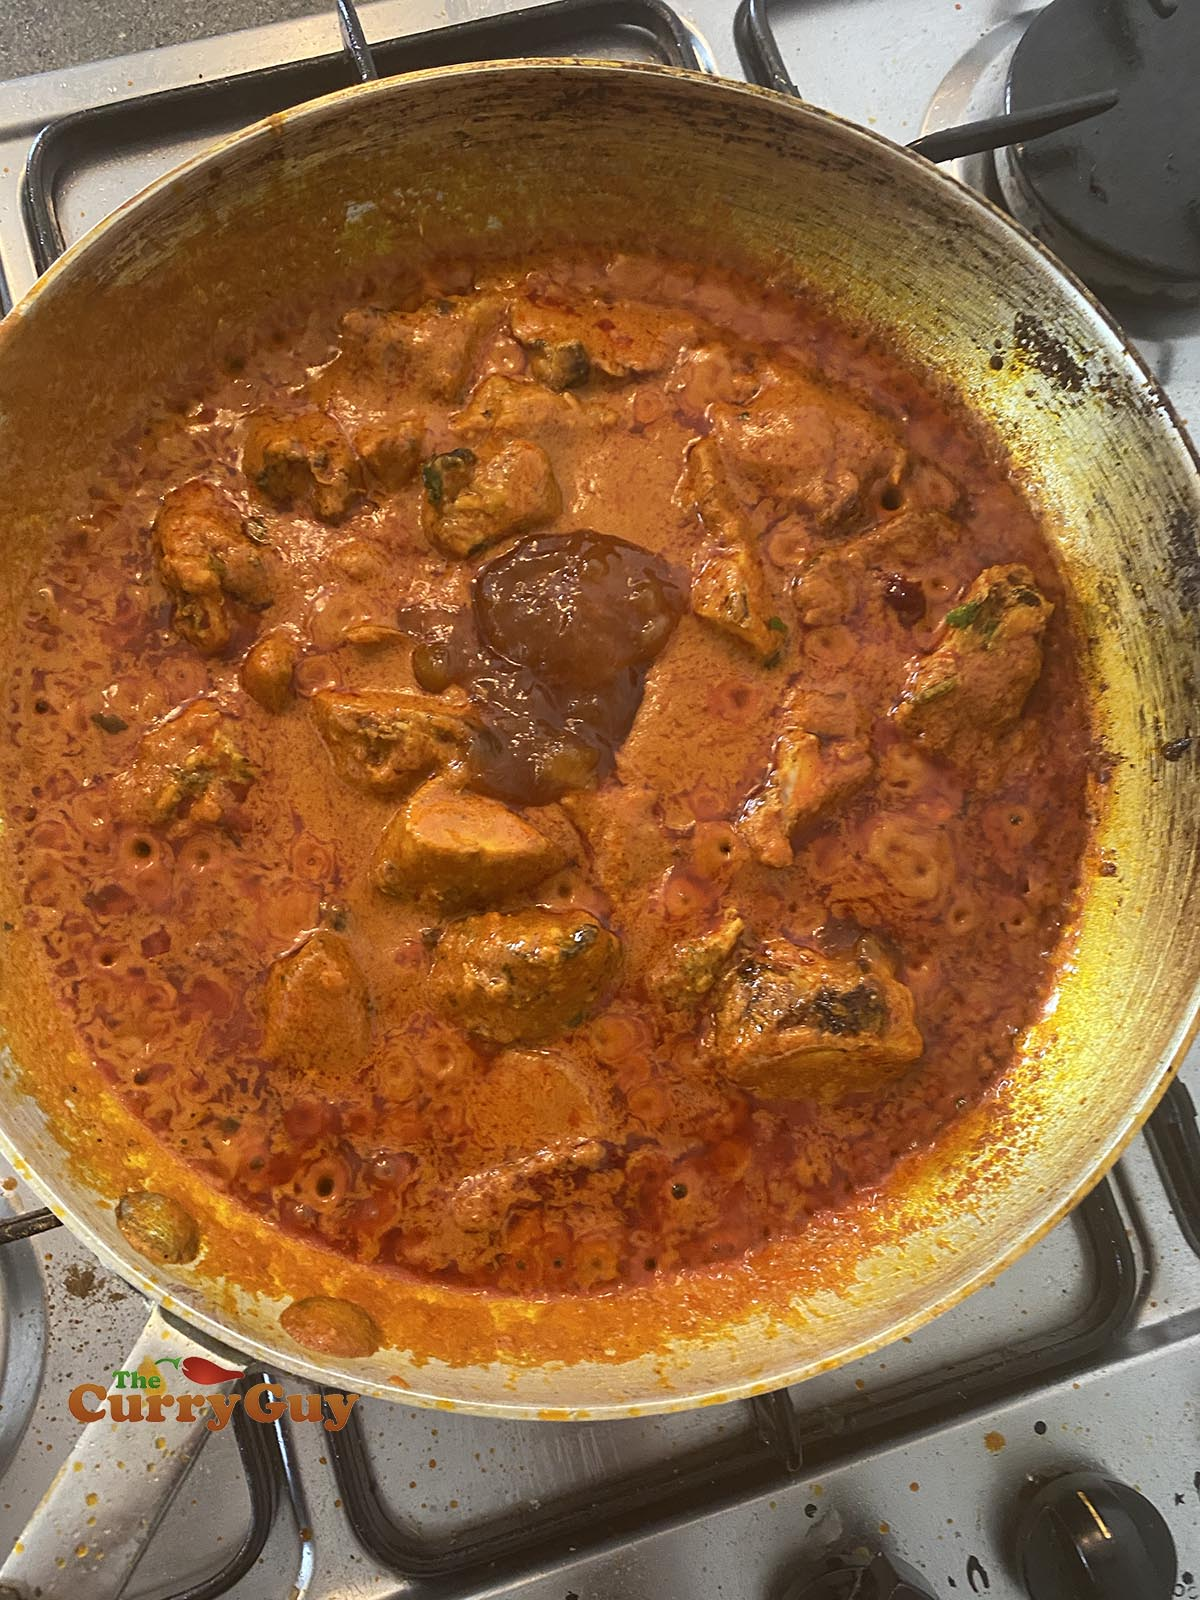 Adding mango chutney to the madras curry